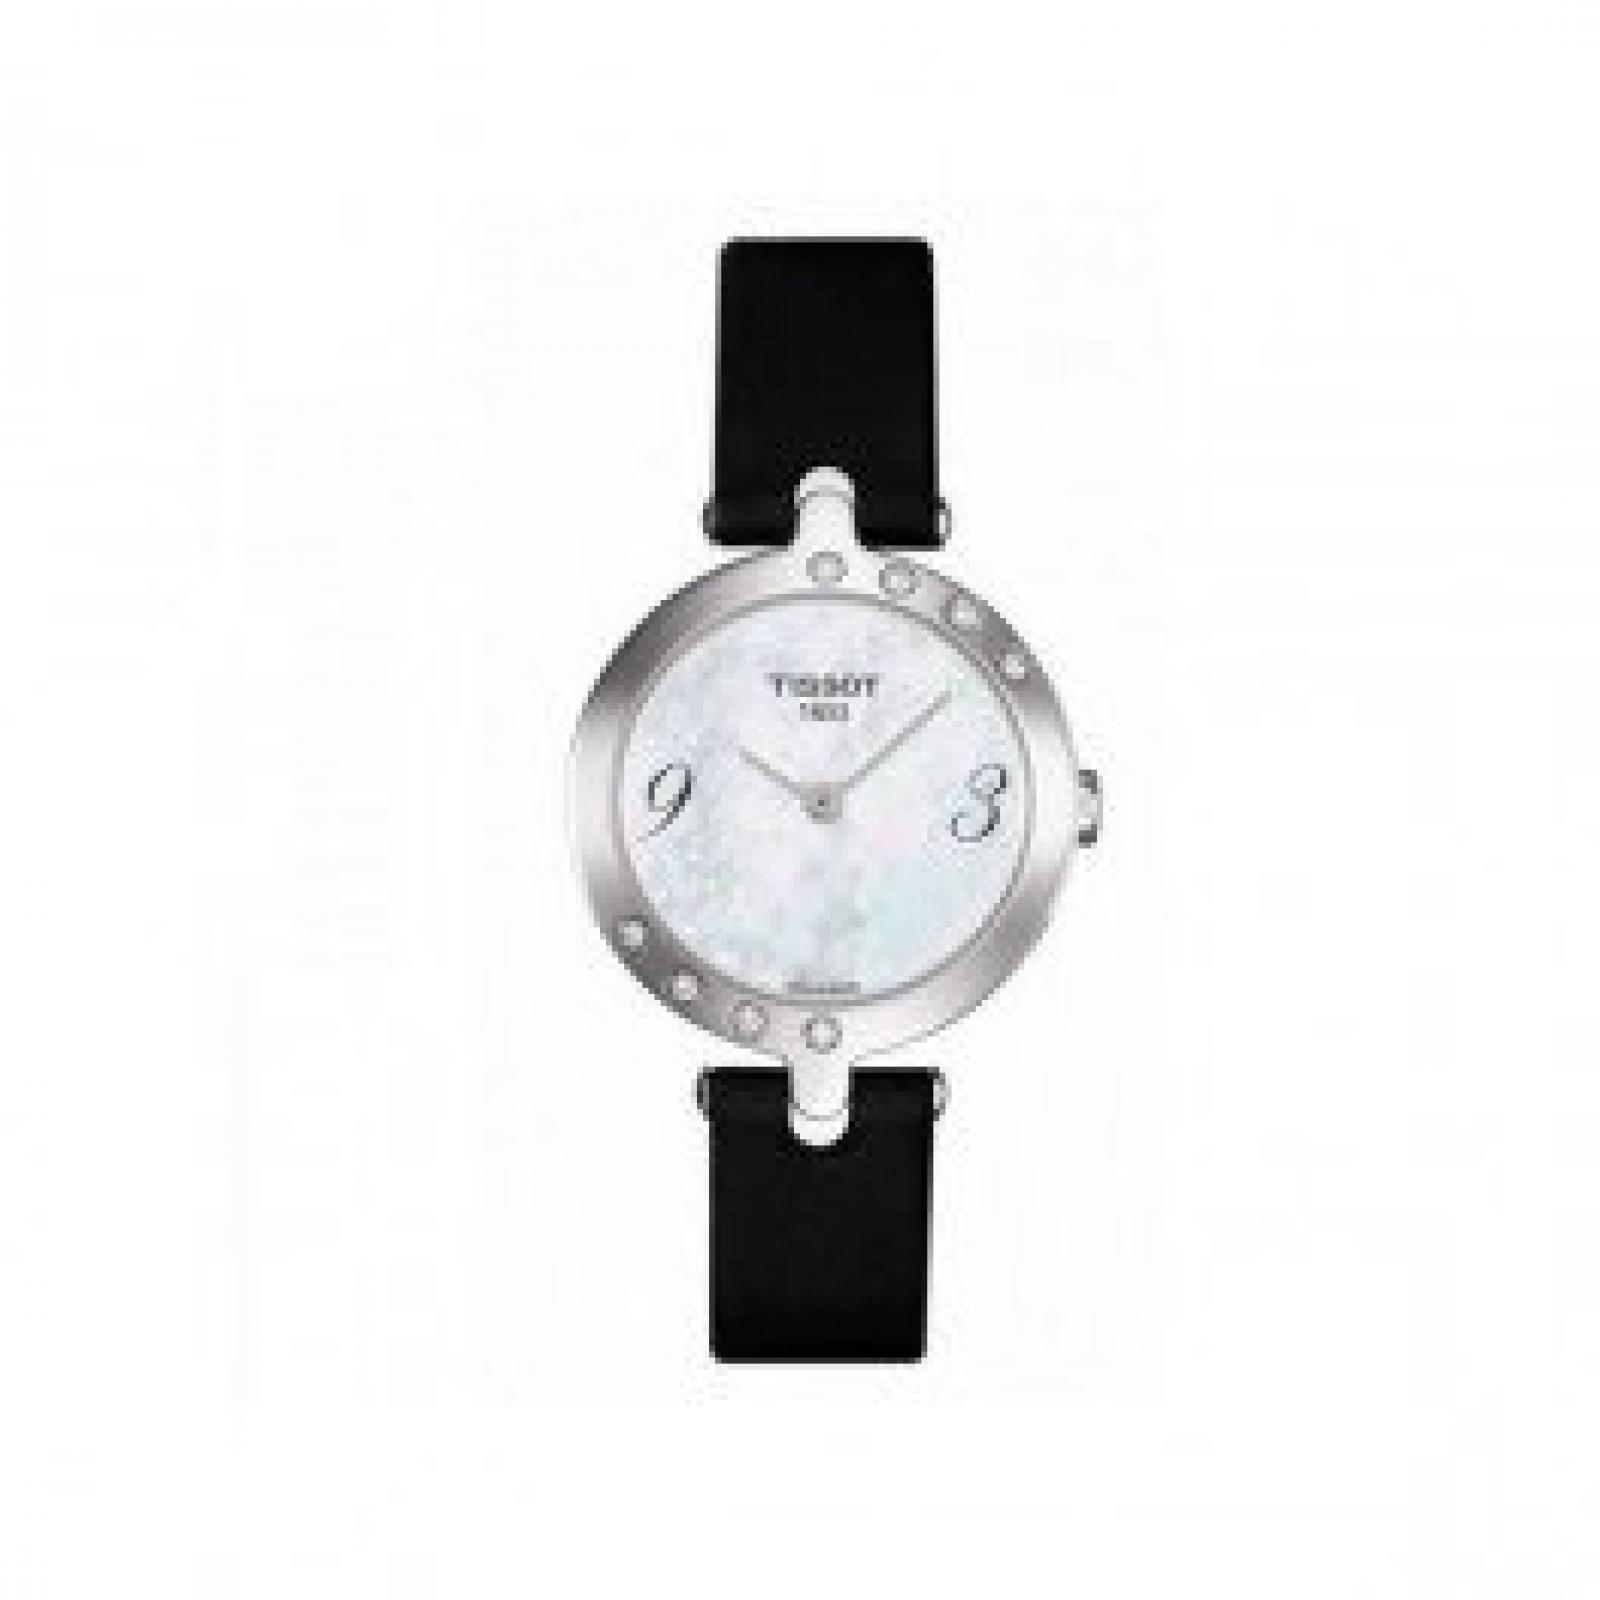 Tissot Ladies Flamingo Diamonds Watch - T0032096711200